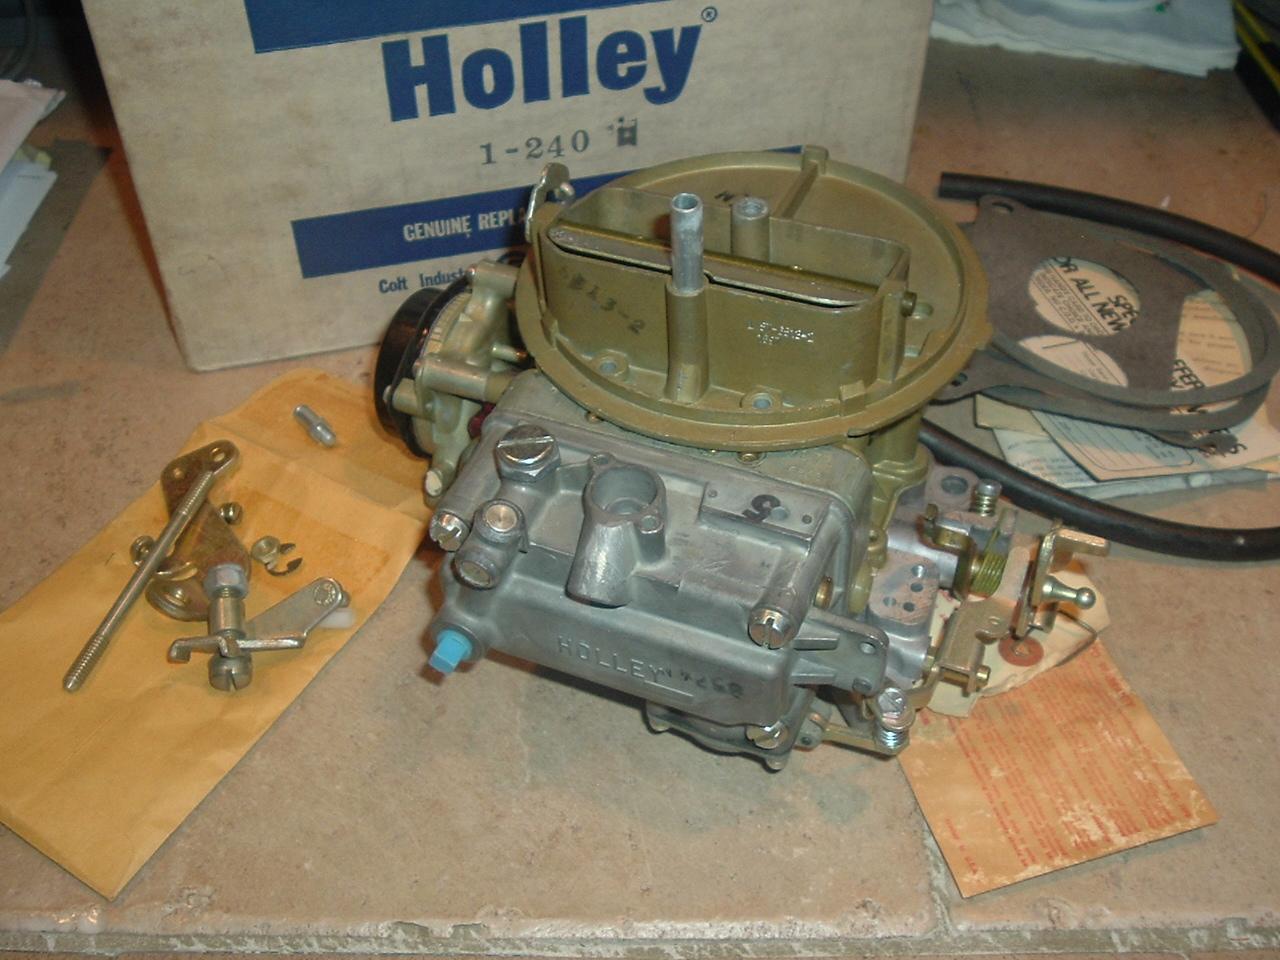 1971- 72 Amc Javelin Hornet Ambassador 304 360 new holley carburetor (a 1-240)